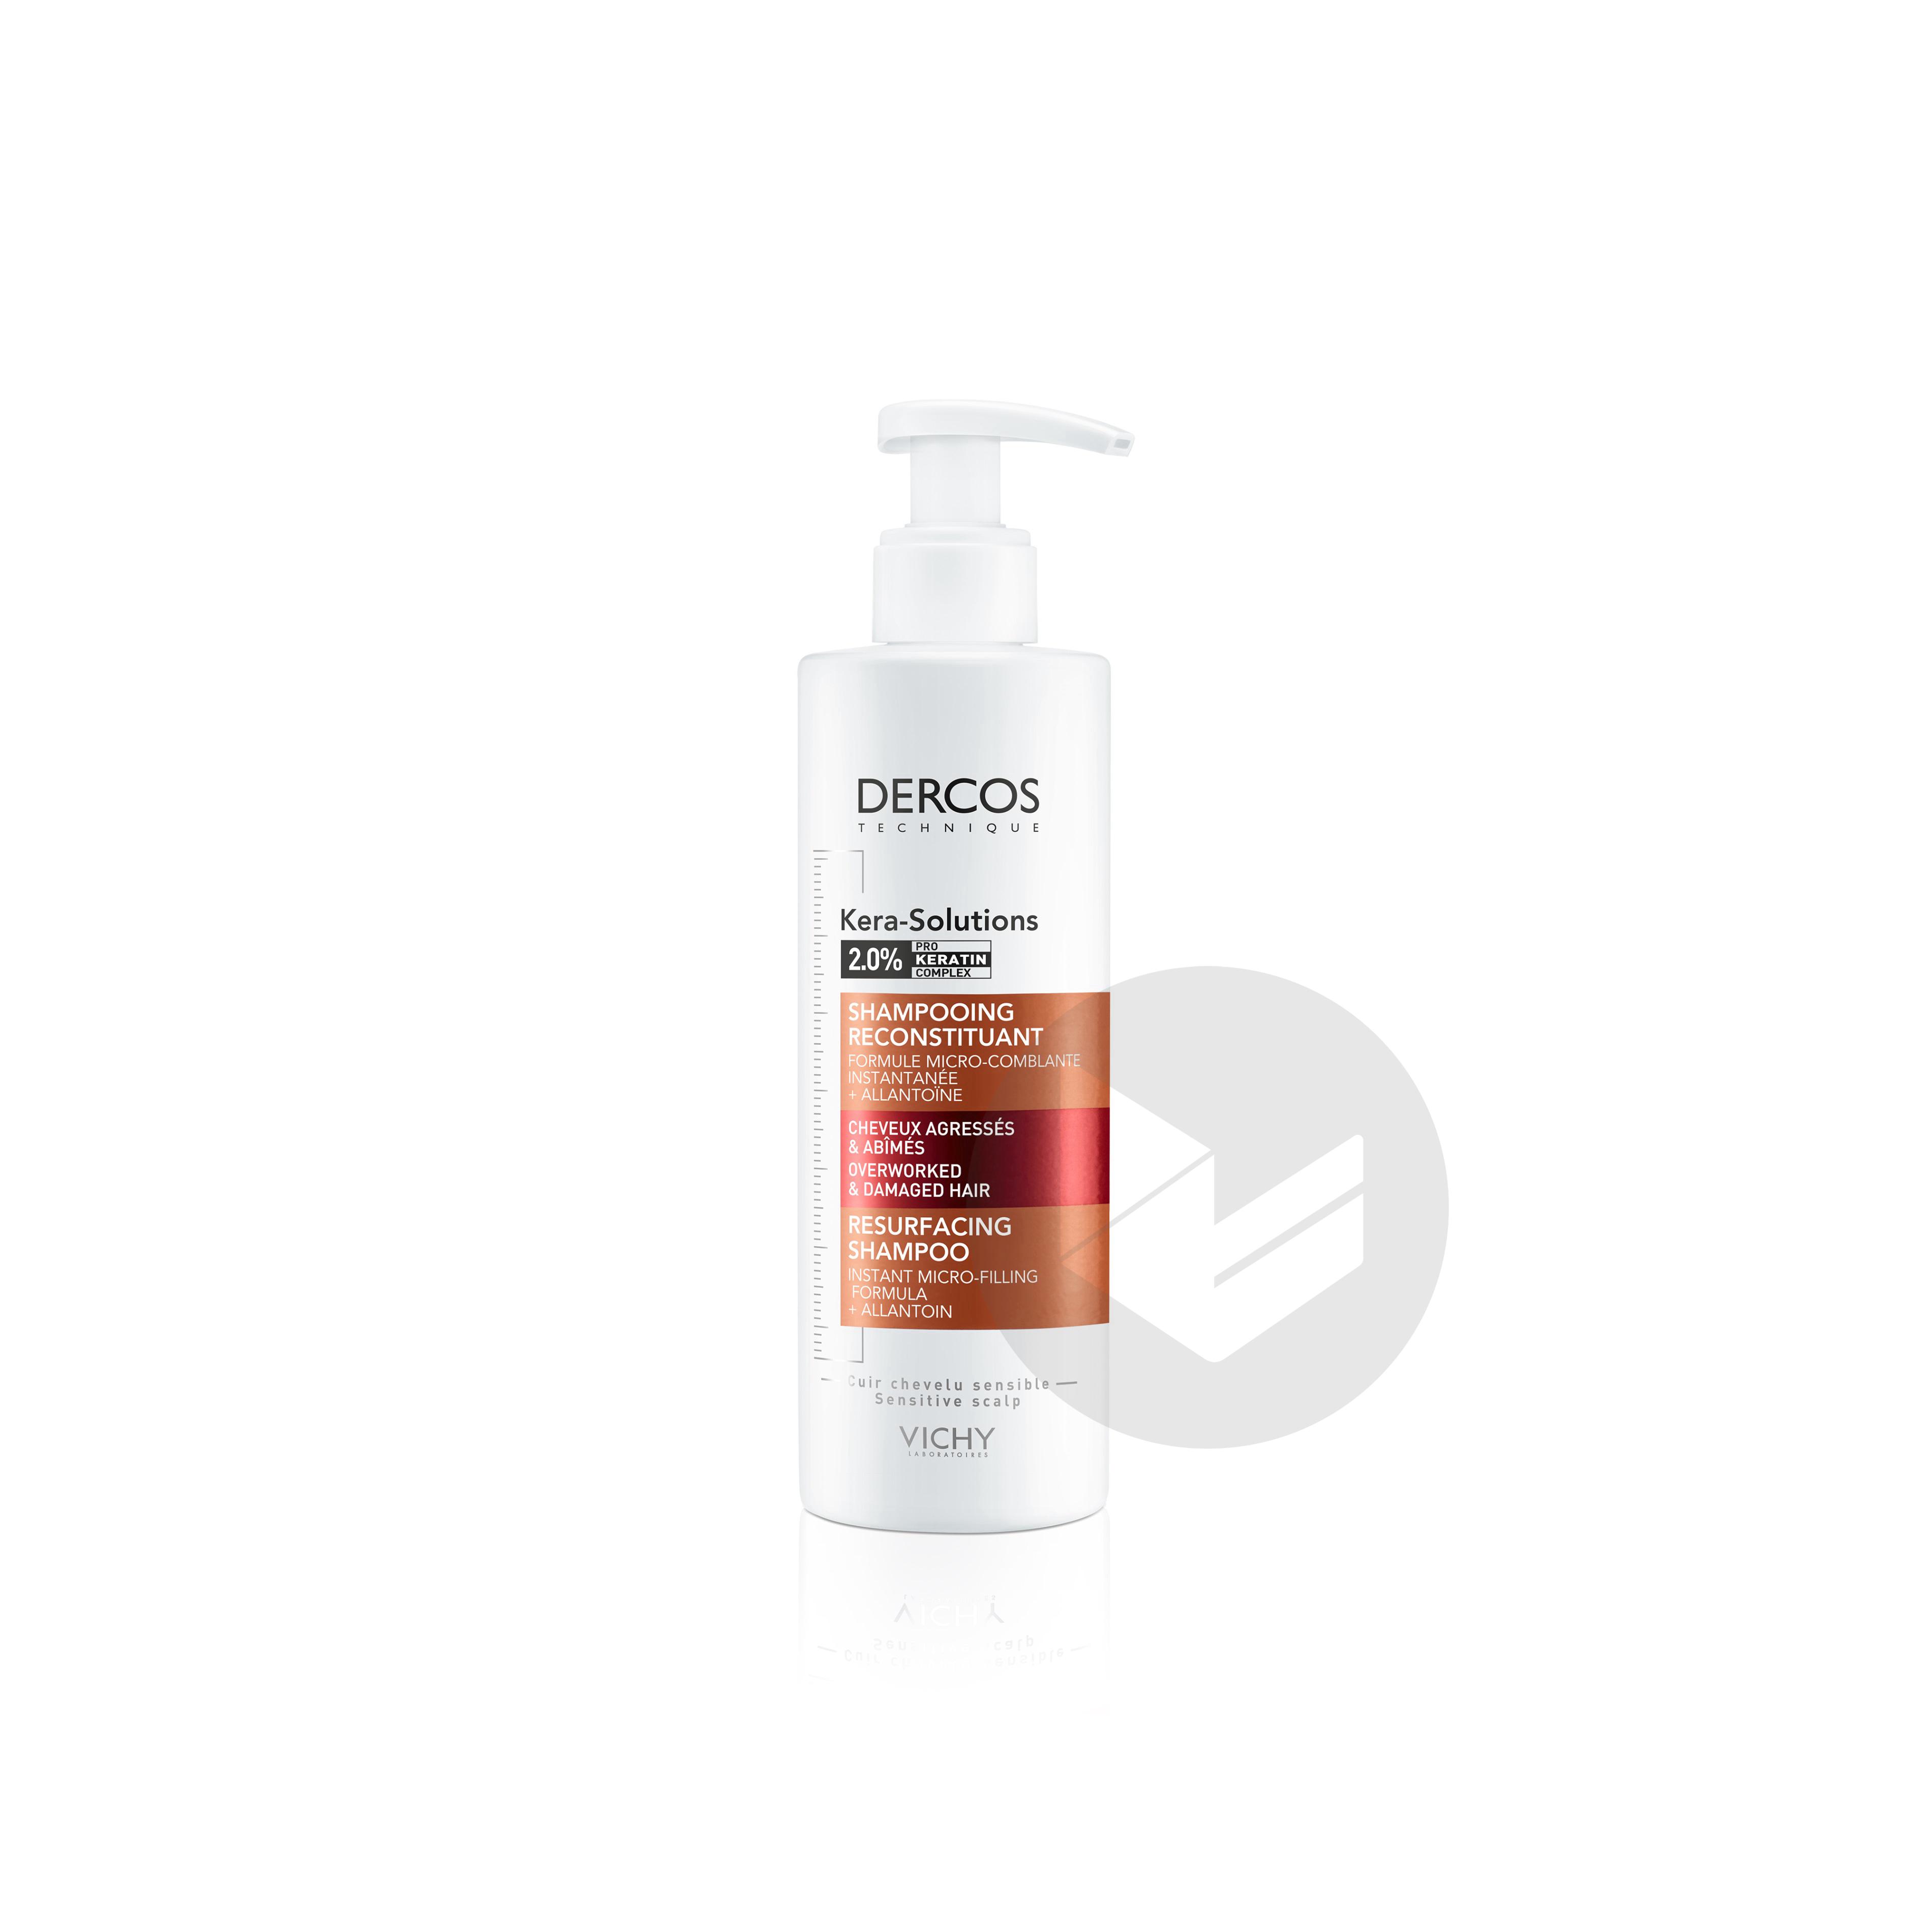 Dercos Technique Kera-Solutions Shampooing Reconstituant 250ml